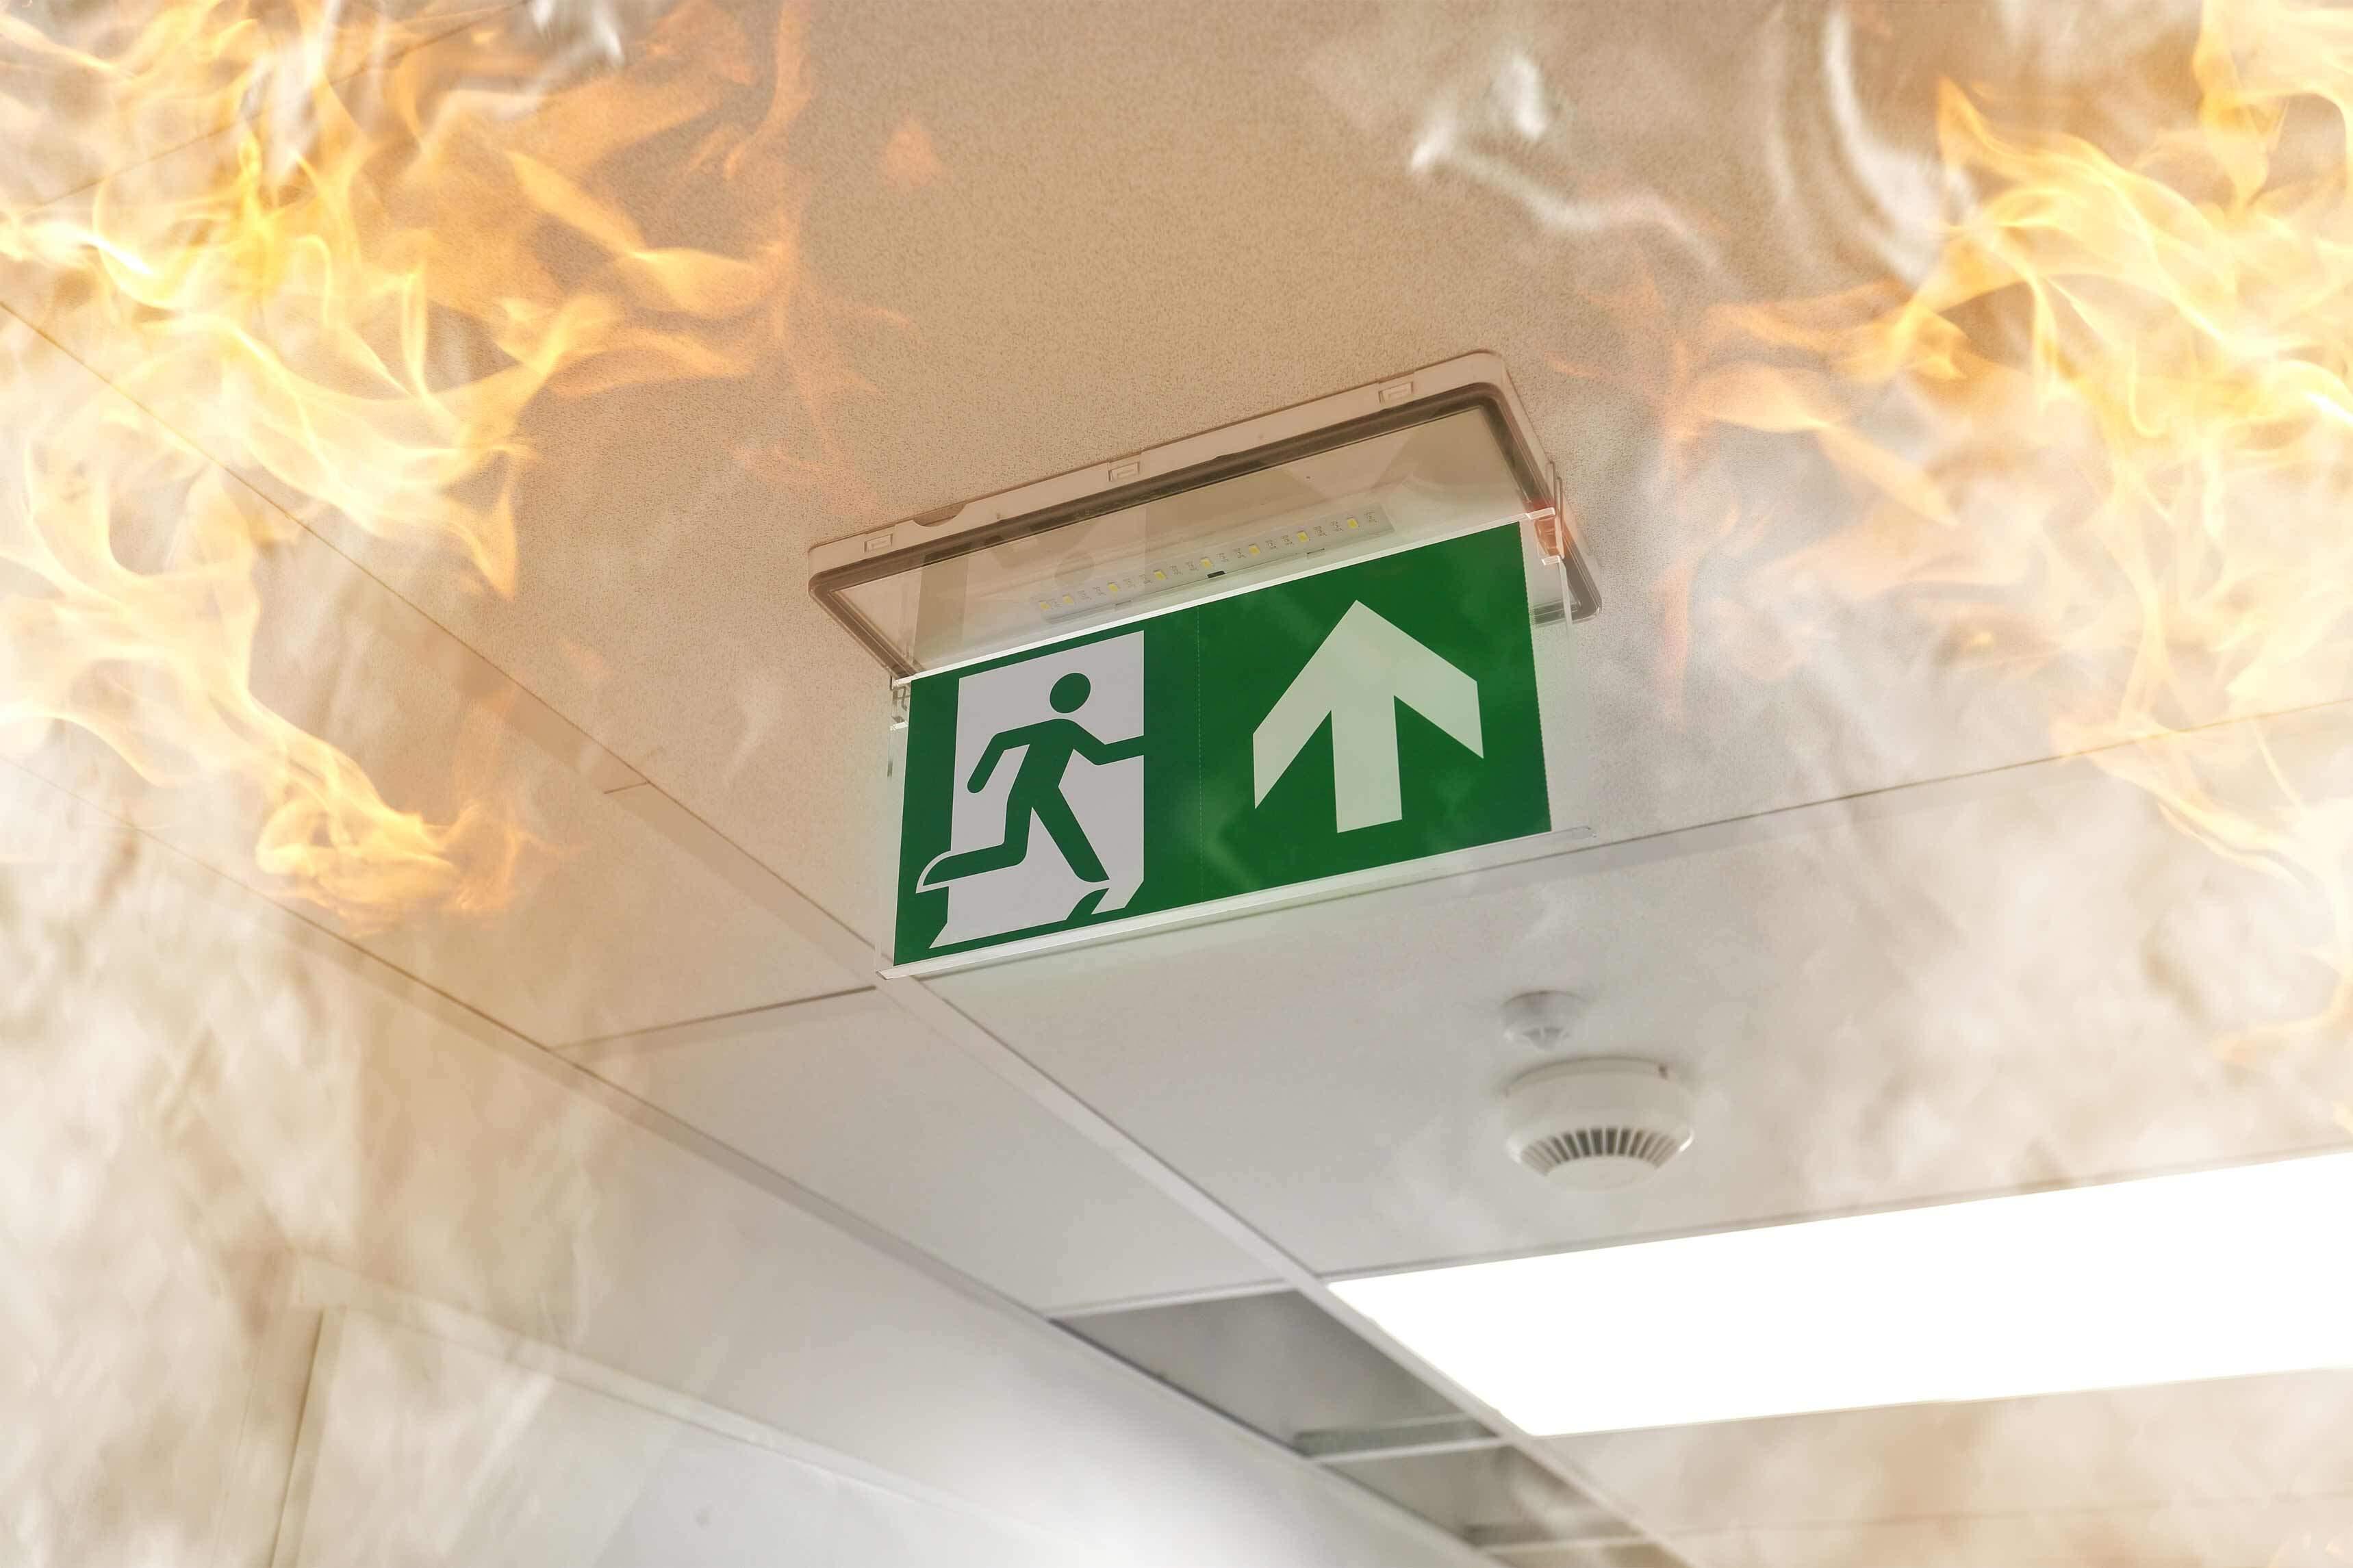 FireEvacuationPLan